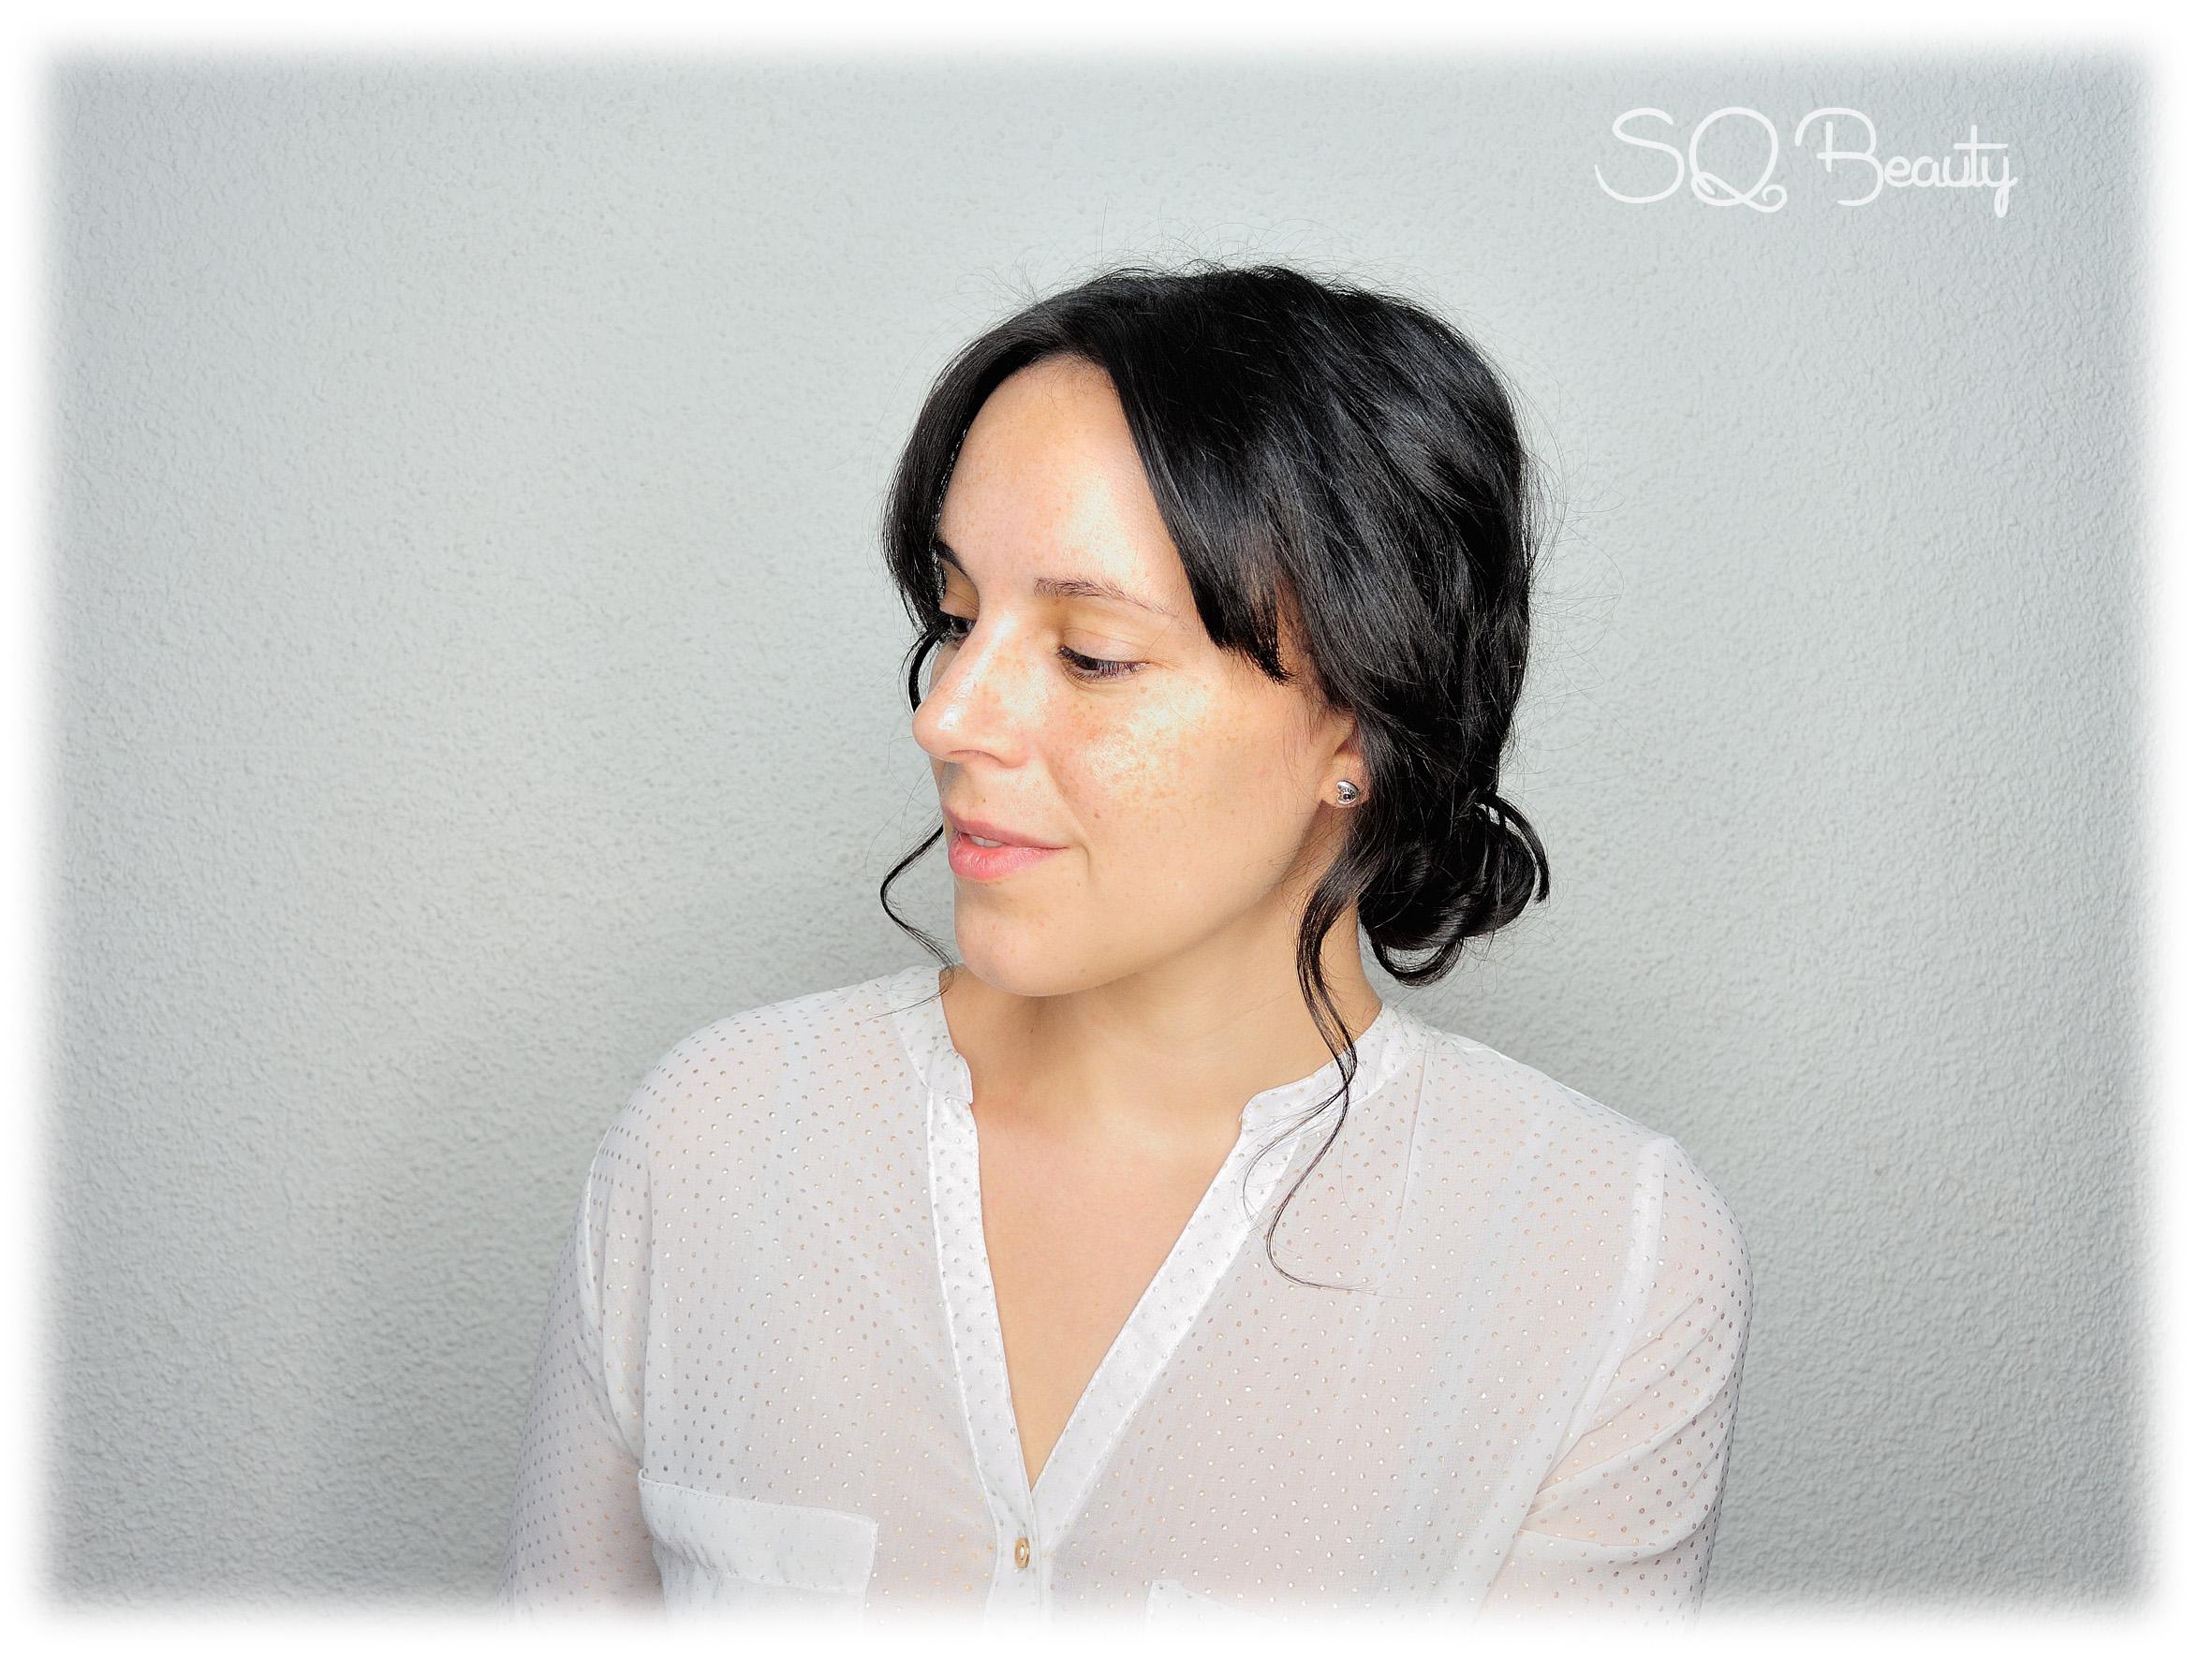 Peinados para San Valentín con Babyliss Curl Secret Valentine´s Day Hairstyle Silvia Quirós SQ Beauty